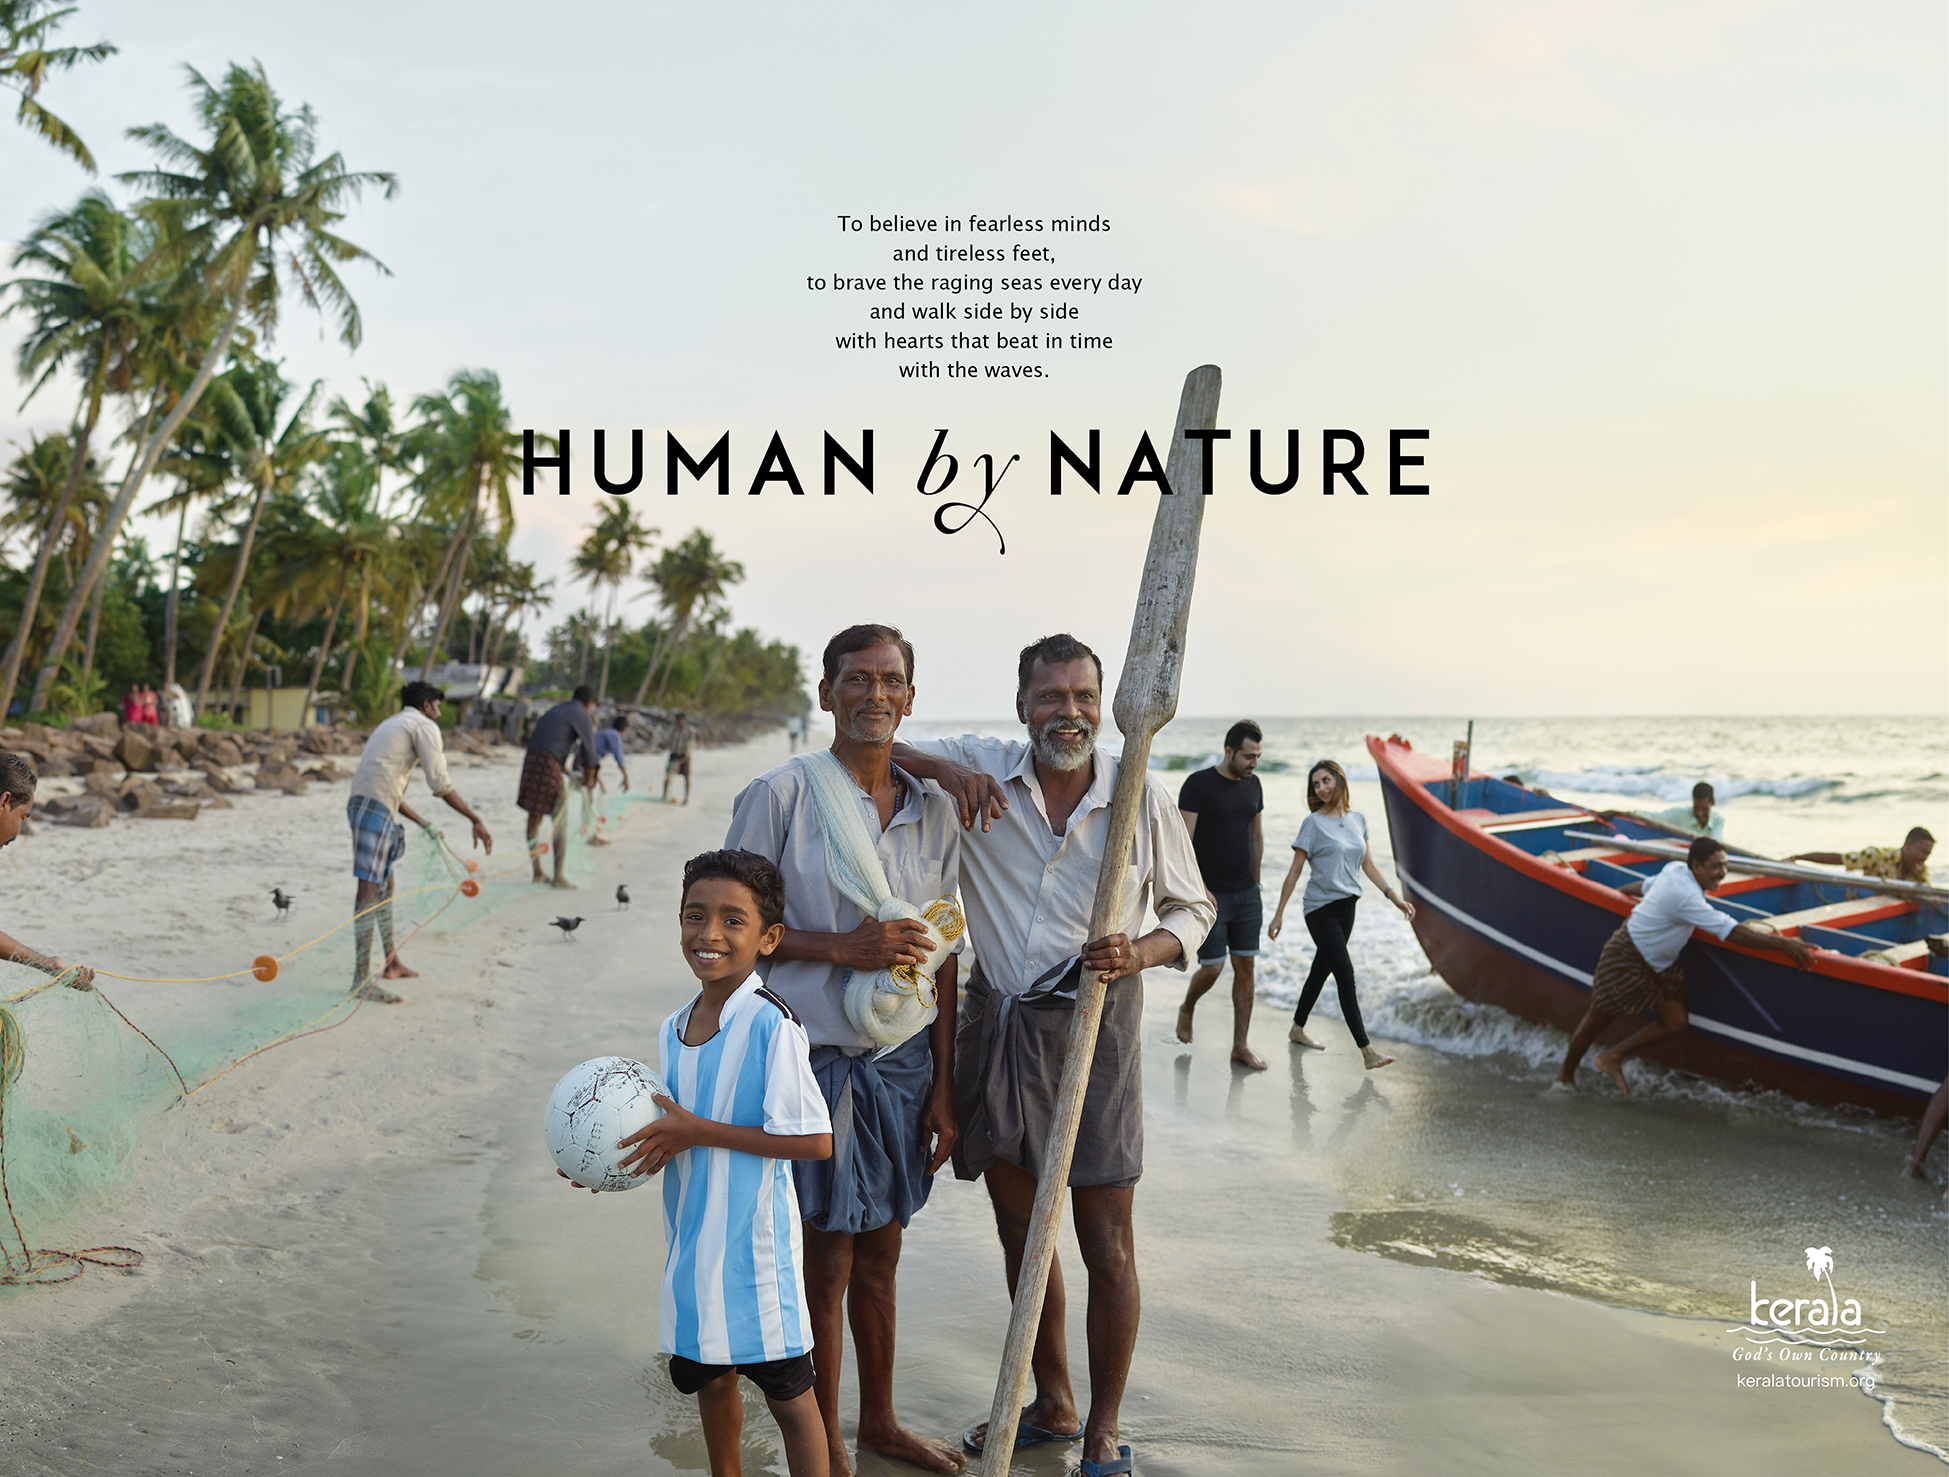 Human by Nature (2) - Kerala Tourism Promotions | Joey L | Stark Communications Pvt Ltd